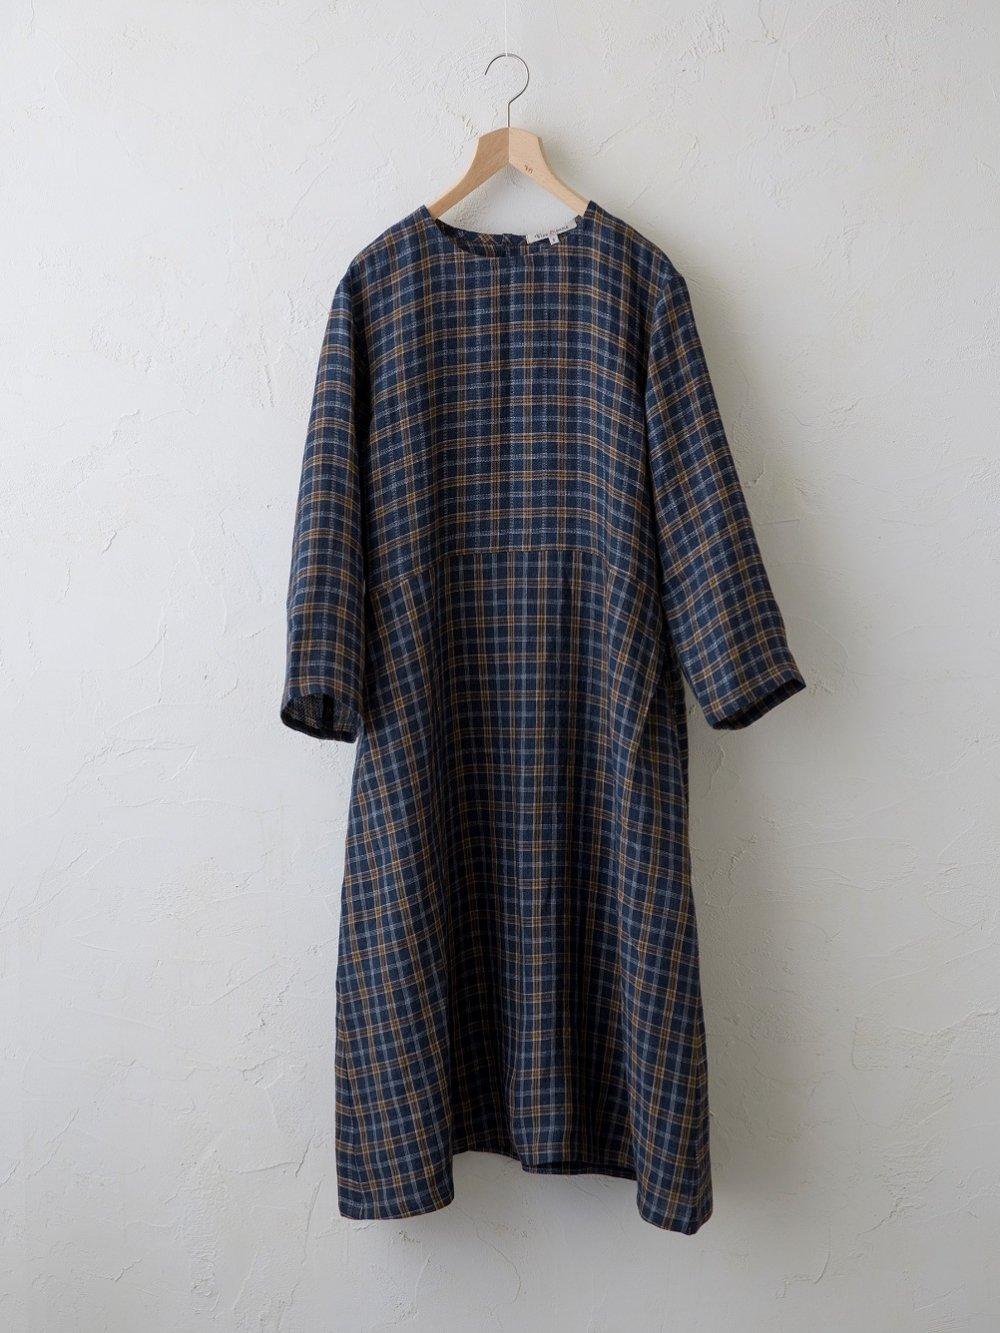 Vintage Check(平織+ドビー) ワンピース